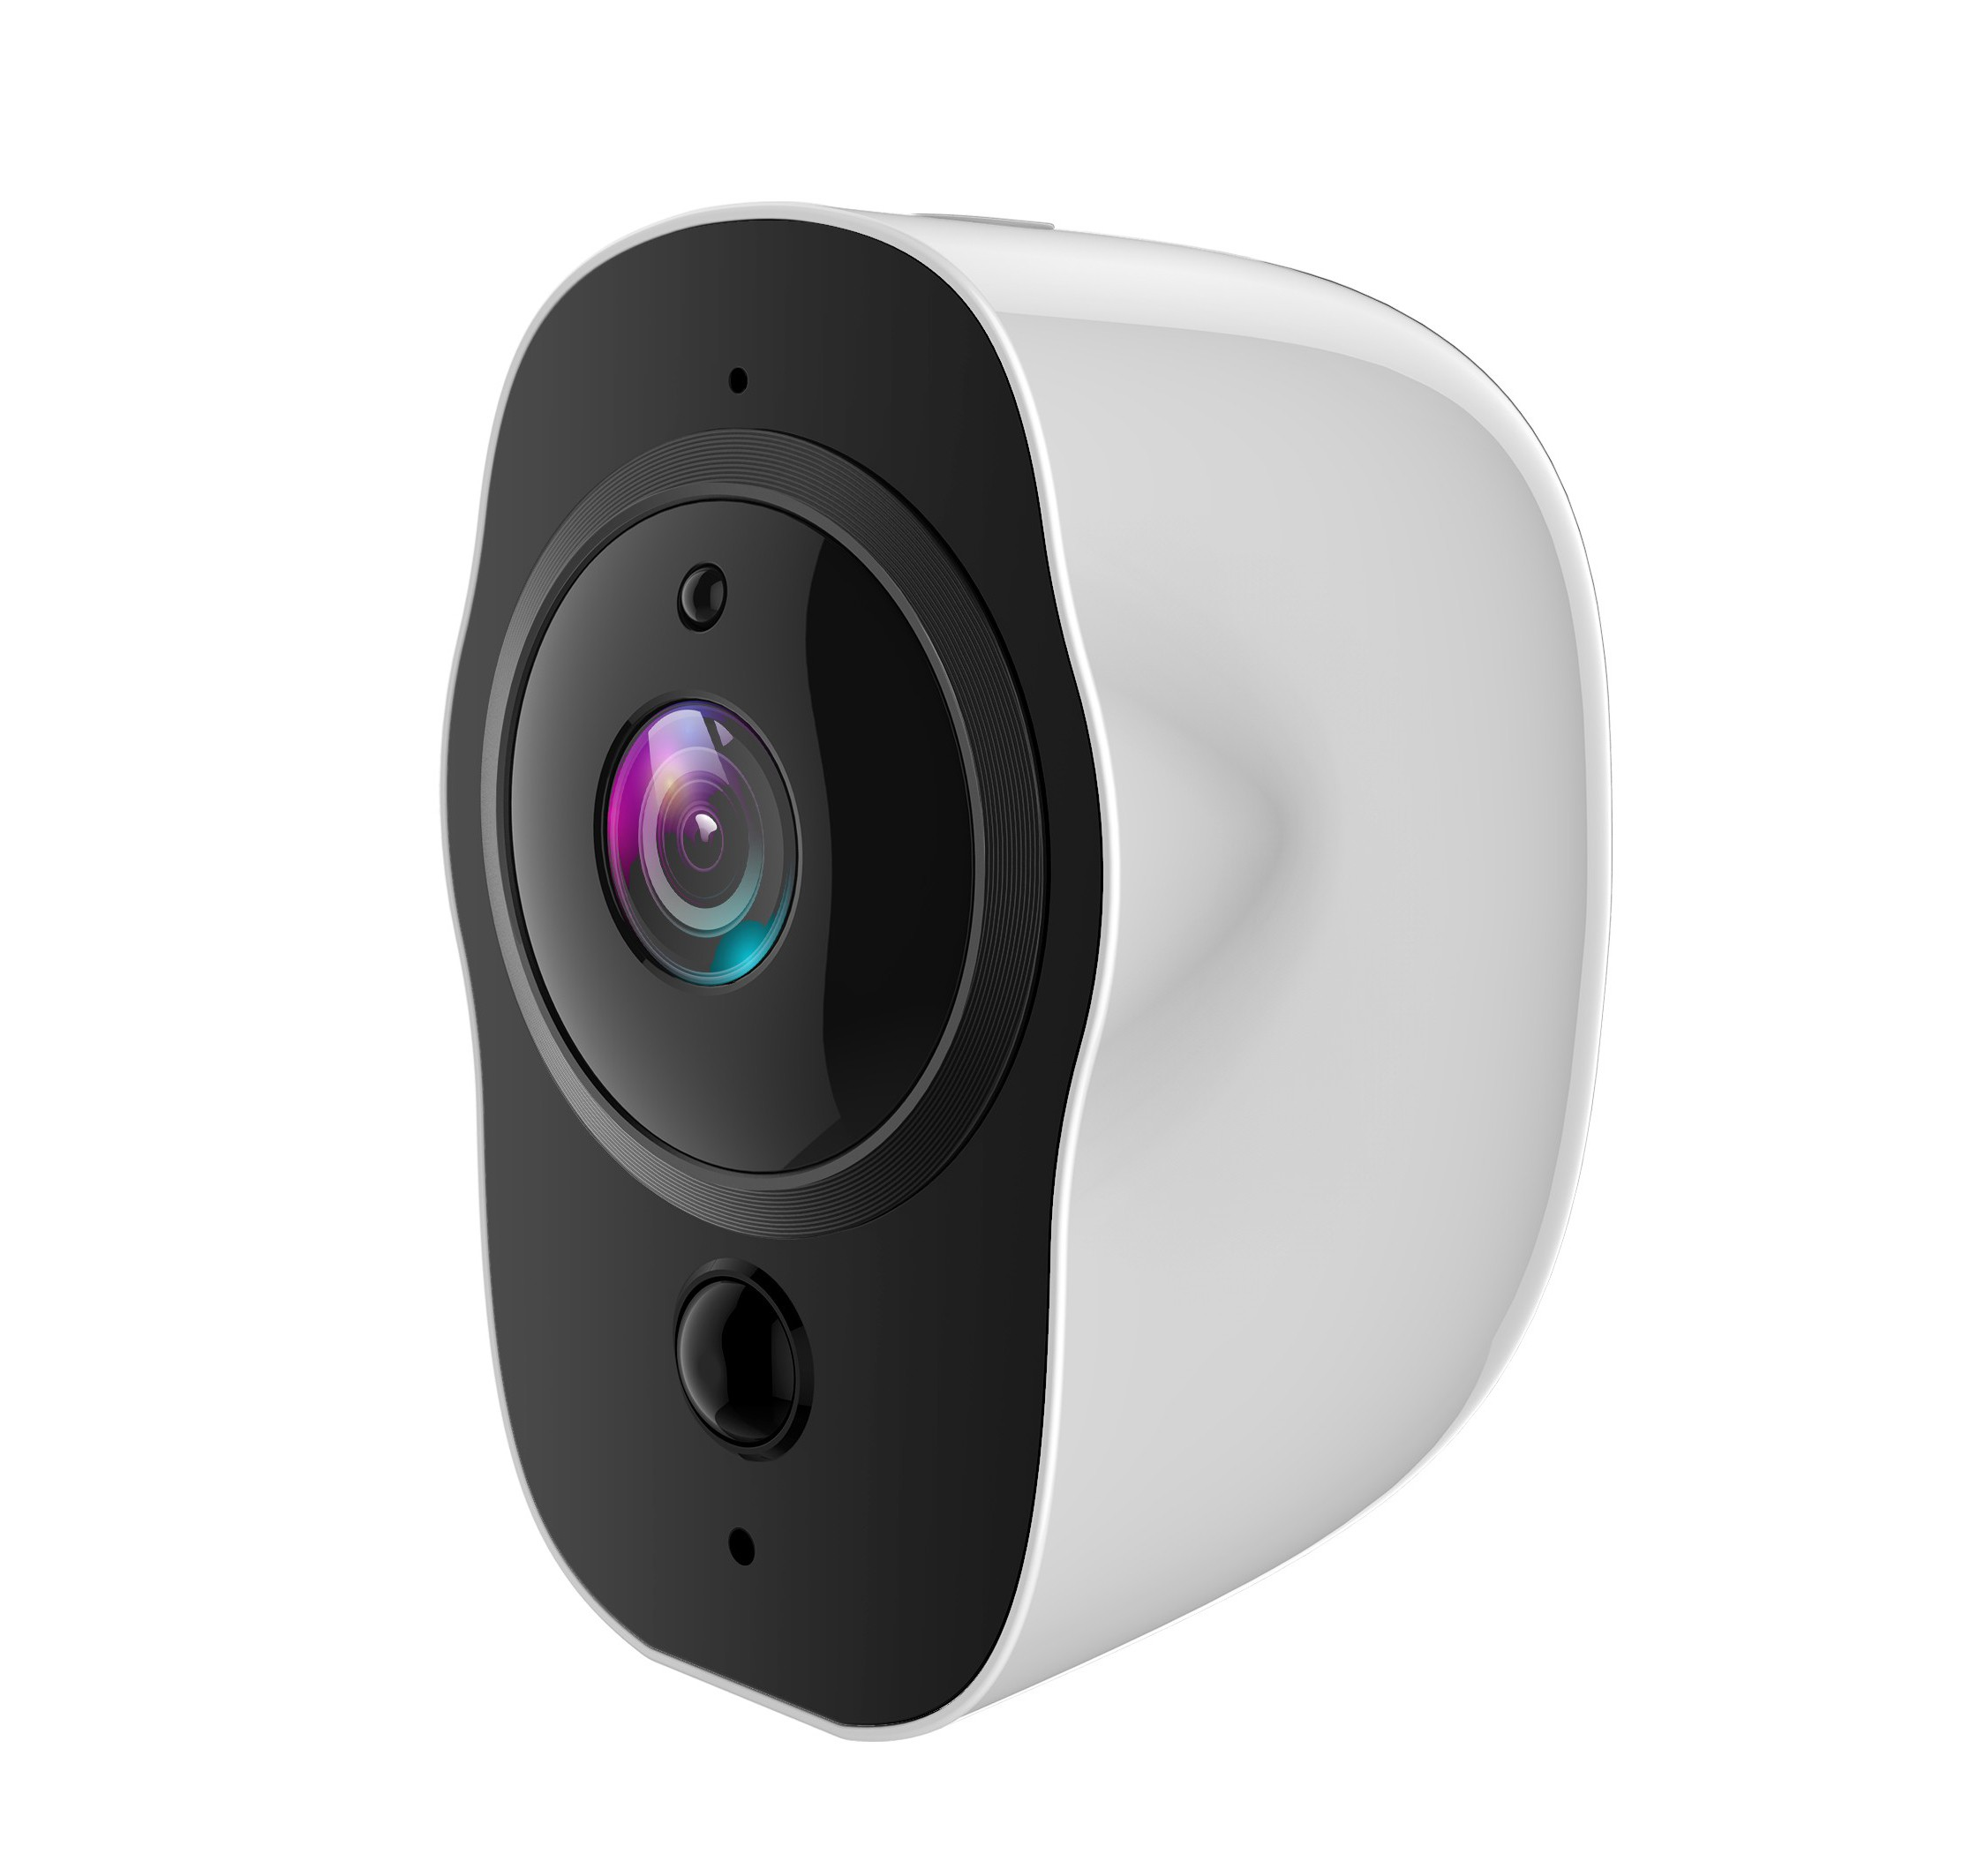 Camera de Supraveghere Interior IP Pan/Tilt Smart Wireless Wi-Fi Techstar® RL113 FULLHD 1080P IR Android & IoS, 4000mAh